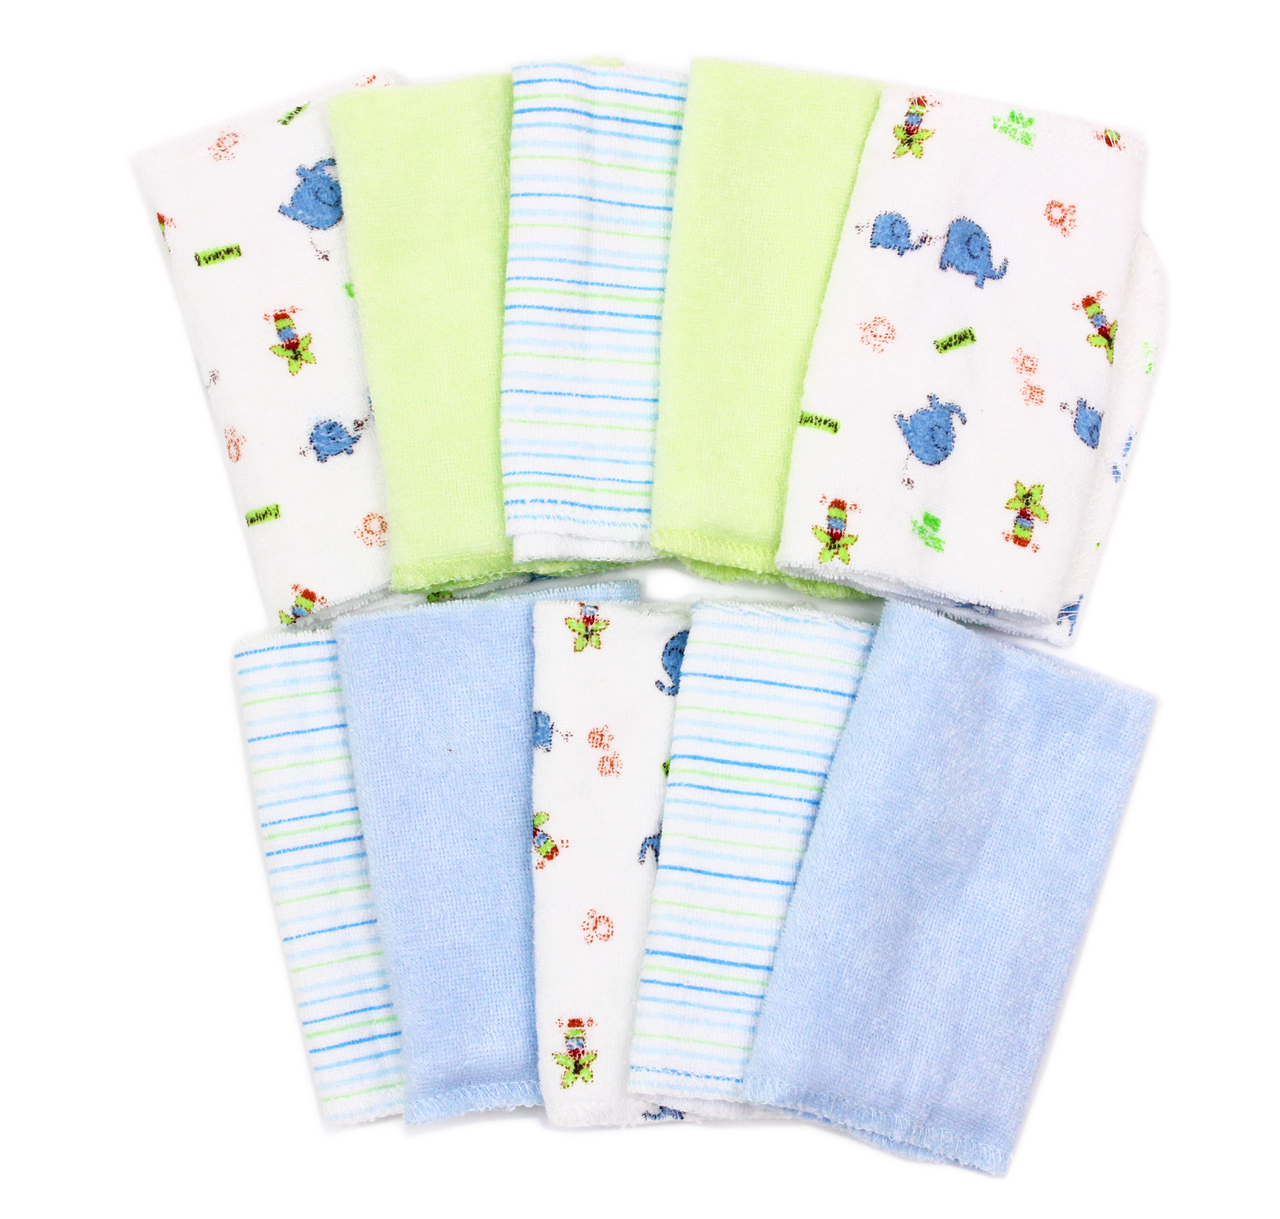 Spasilk 10 Pack Washcloth